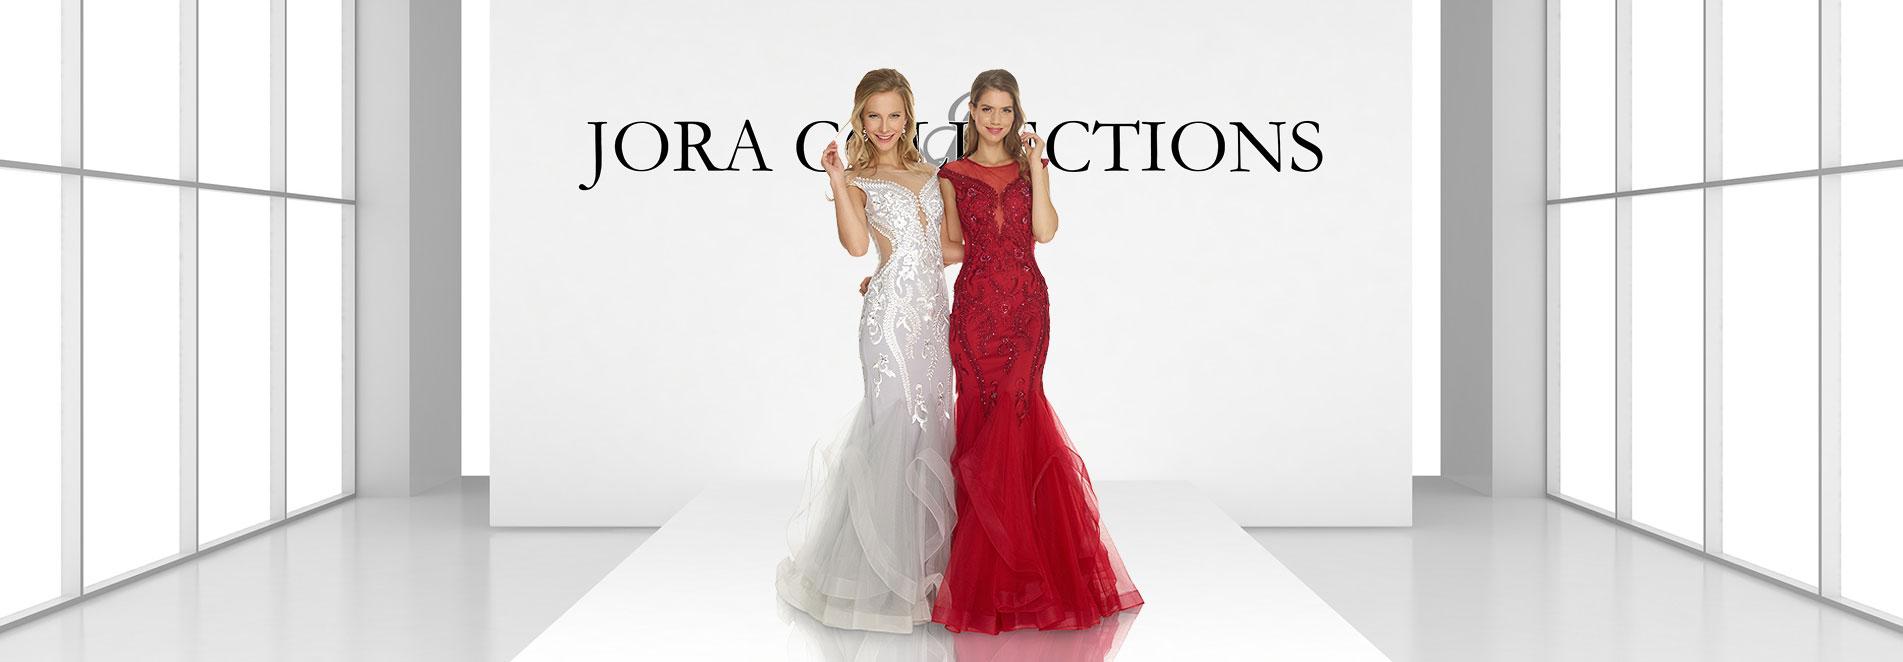 Jora Collections Fine Quality Prom Dresses Formal Wear Jora